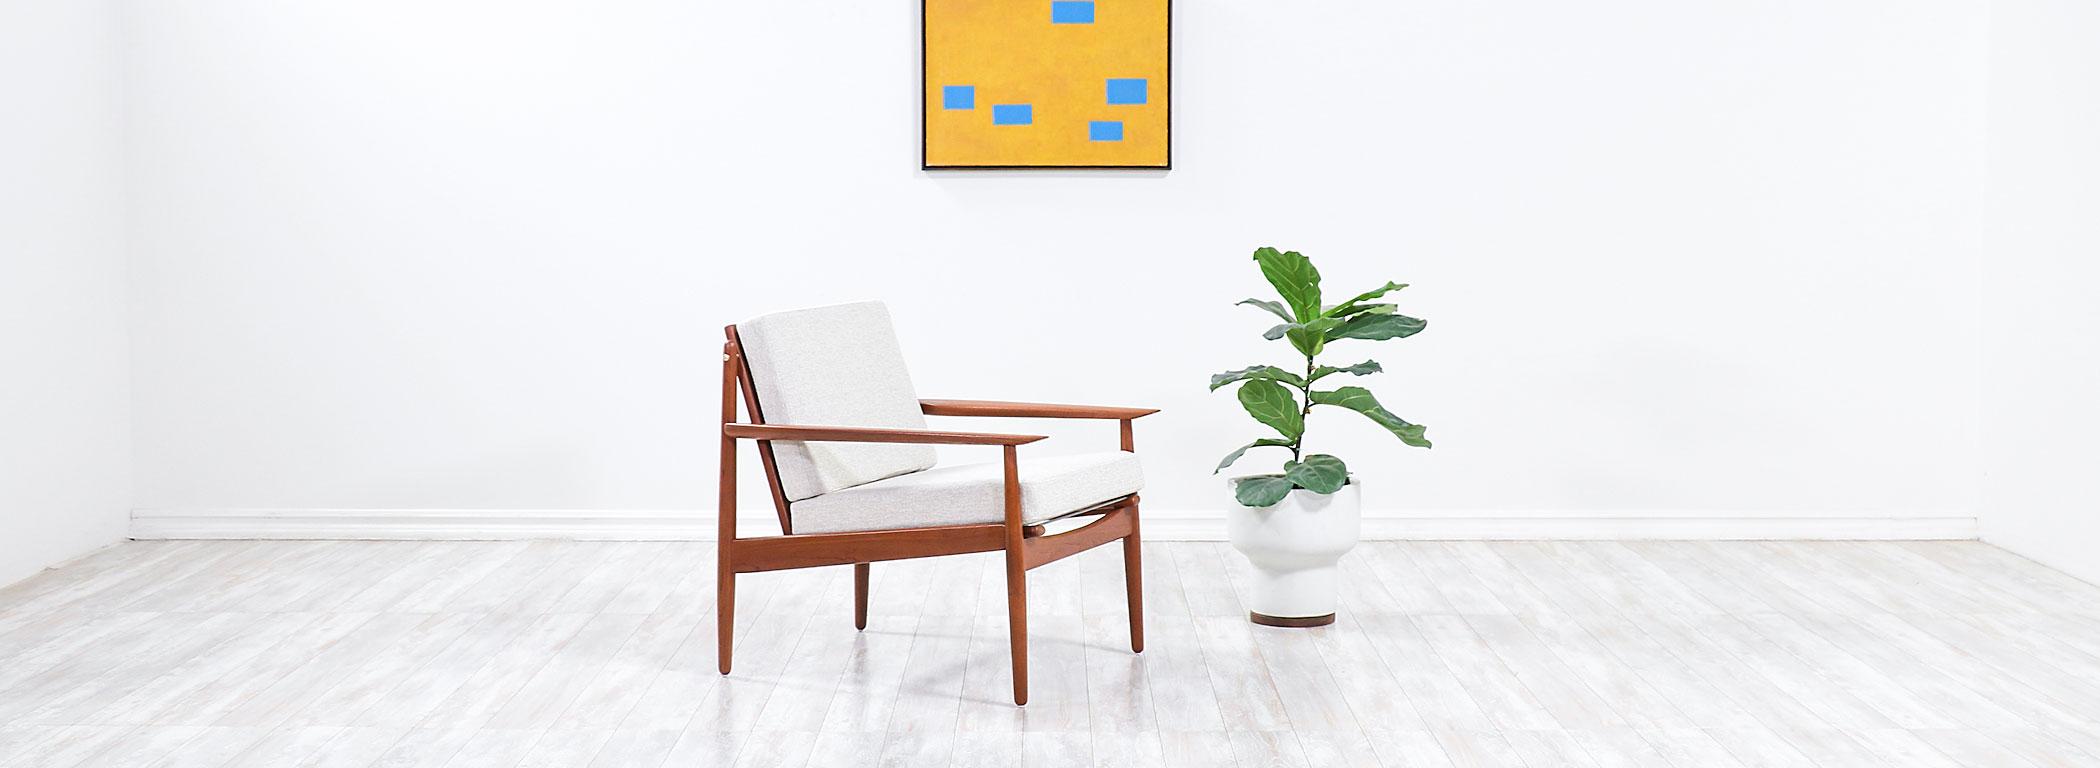 Svend Age Eriksen Teak Lounge Chair for Glostrup Møbelfabrik  Image